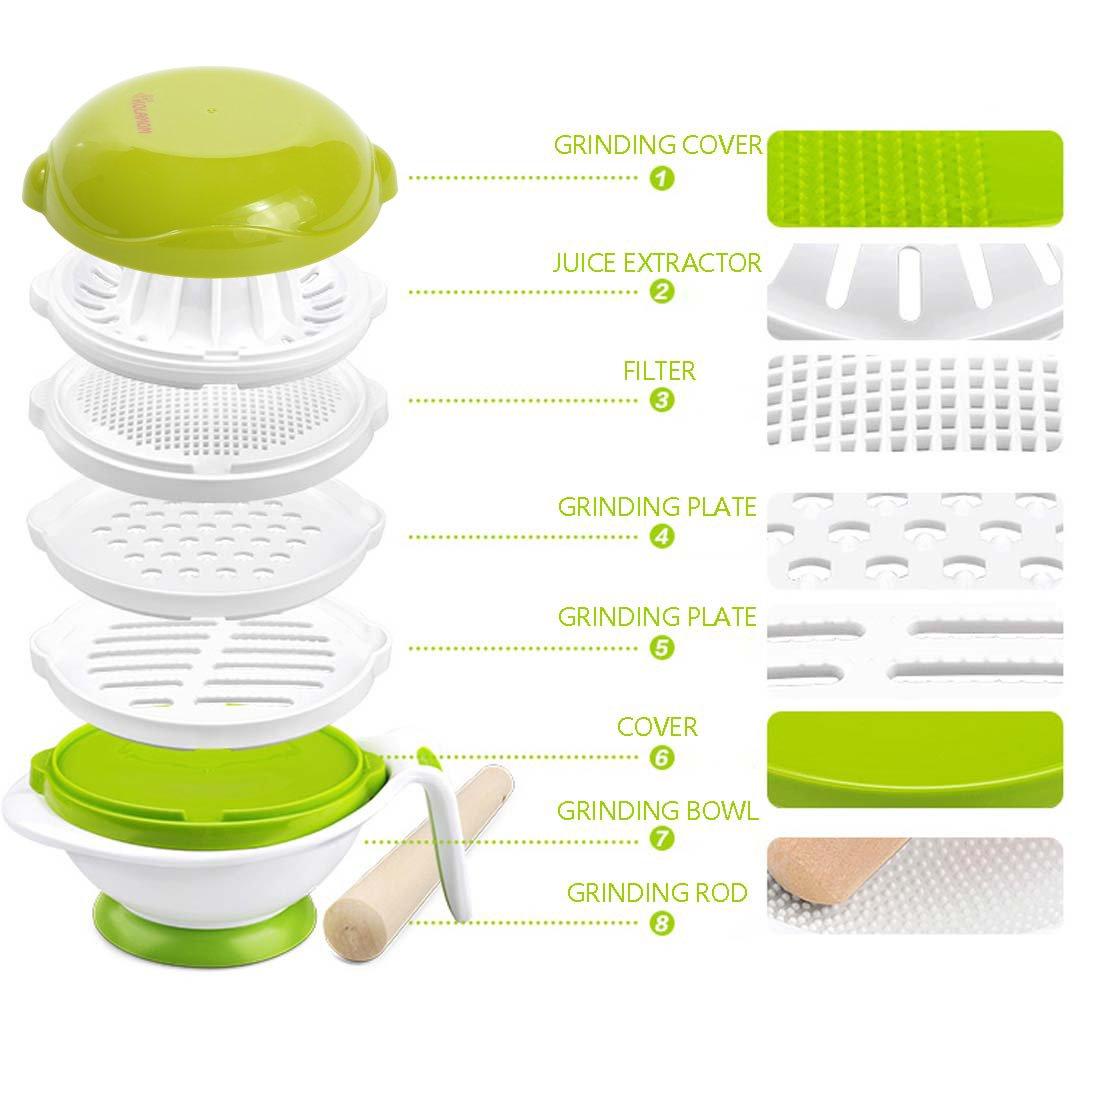 Baby Food Mill Grinding Bowl Grinder Processor Multifunction Mash Prep Serving DIY Homemade 8 in 1 Set by Kolamom, Upgrade by Kolamom (Image #4)